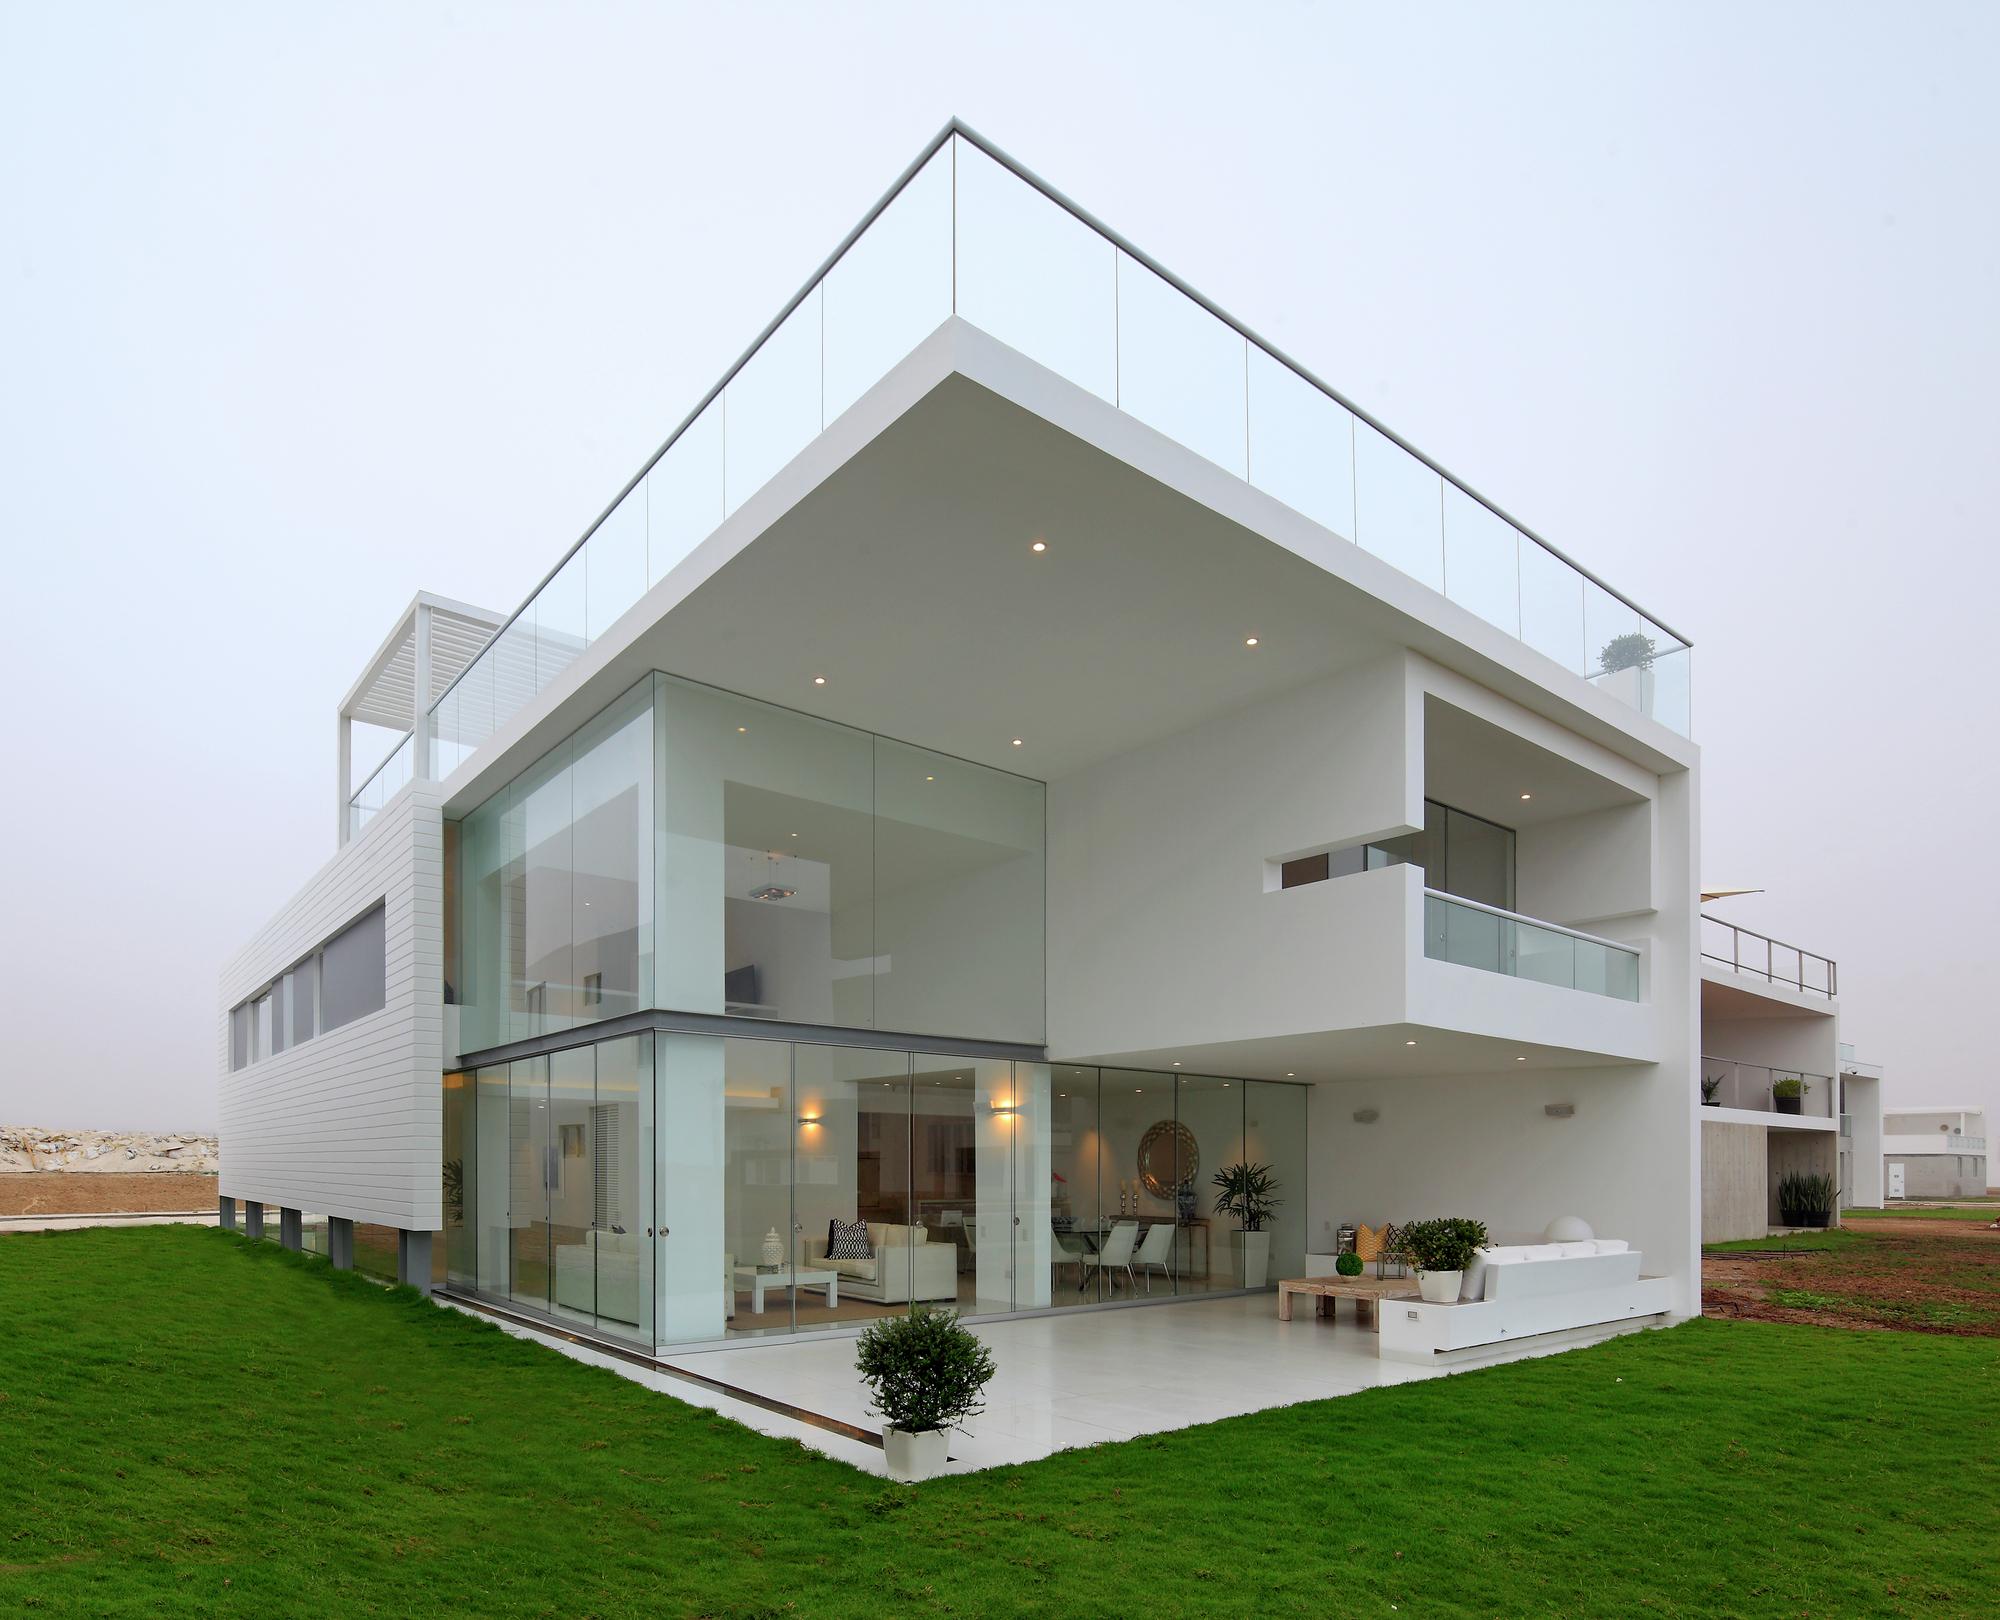 Galer a de casa mb rubio arquitectos 1 - Arquitectos madrid 2 0 ...